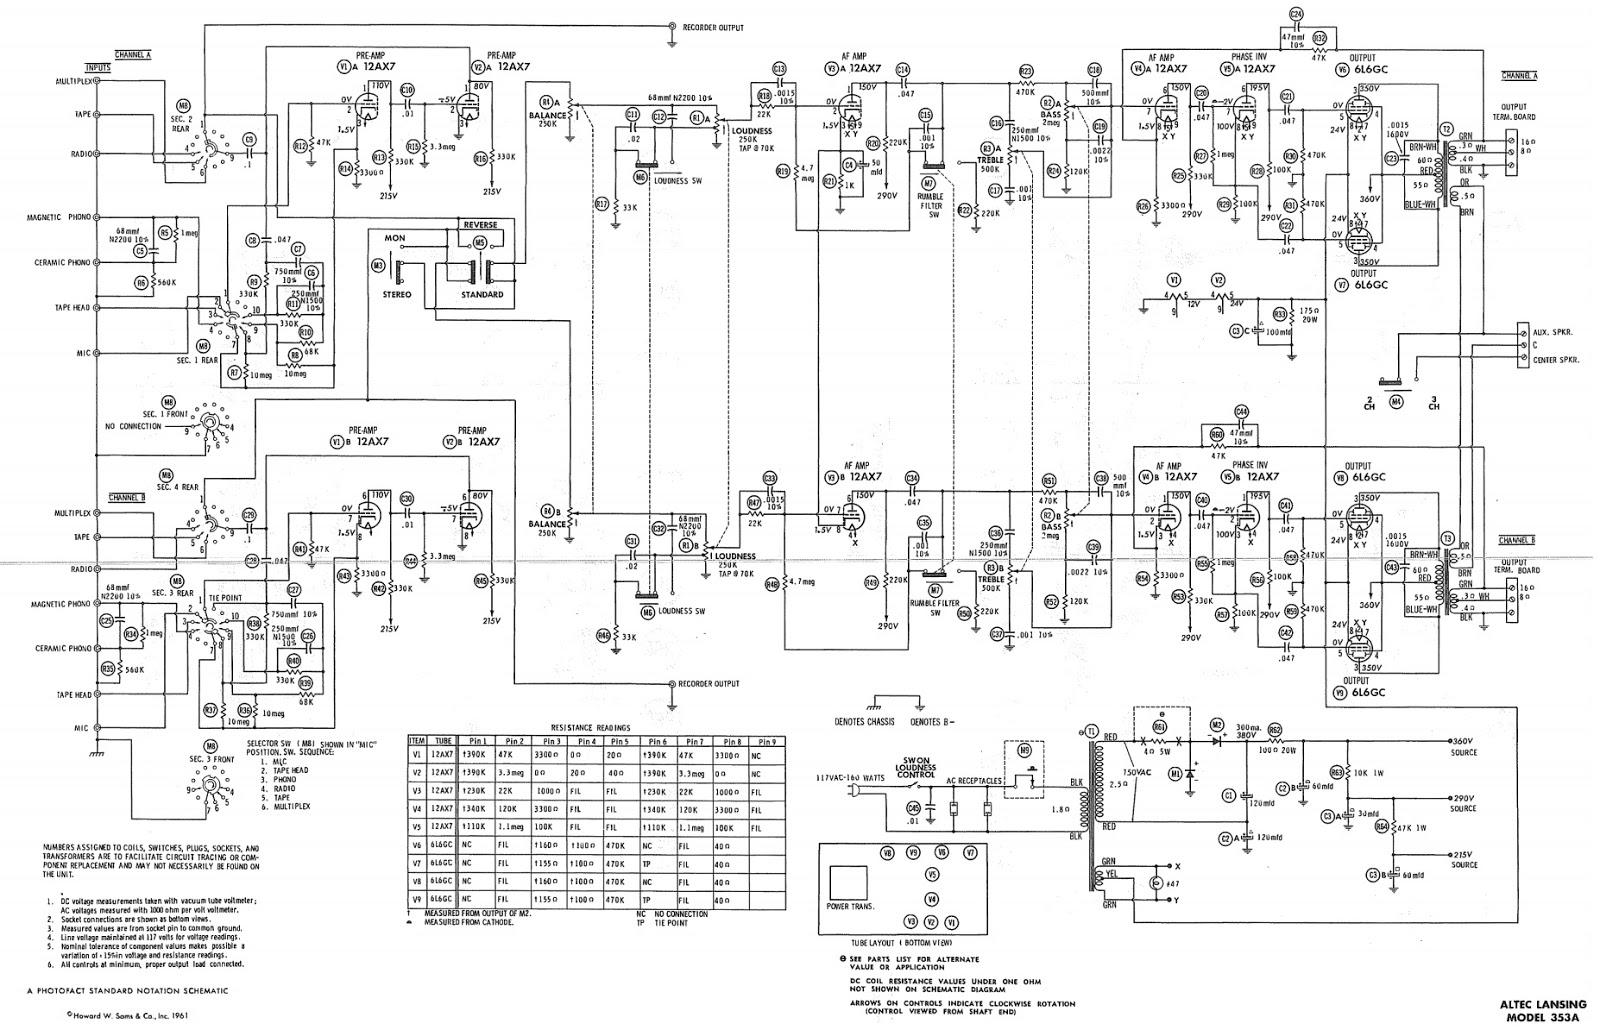 hight resolution of altec ta60 wiring diagram schematics wiring diagrams u2022 rh parntesis co altec bucket covers altec bucket